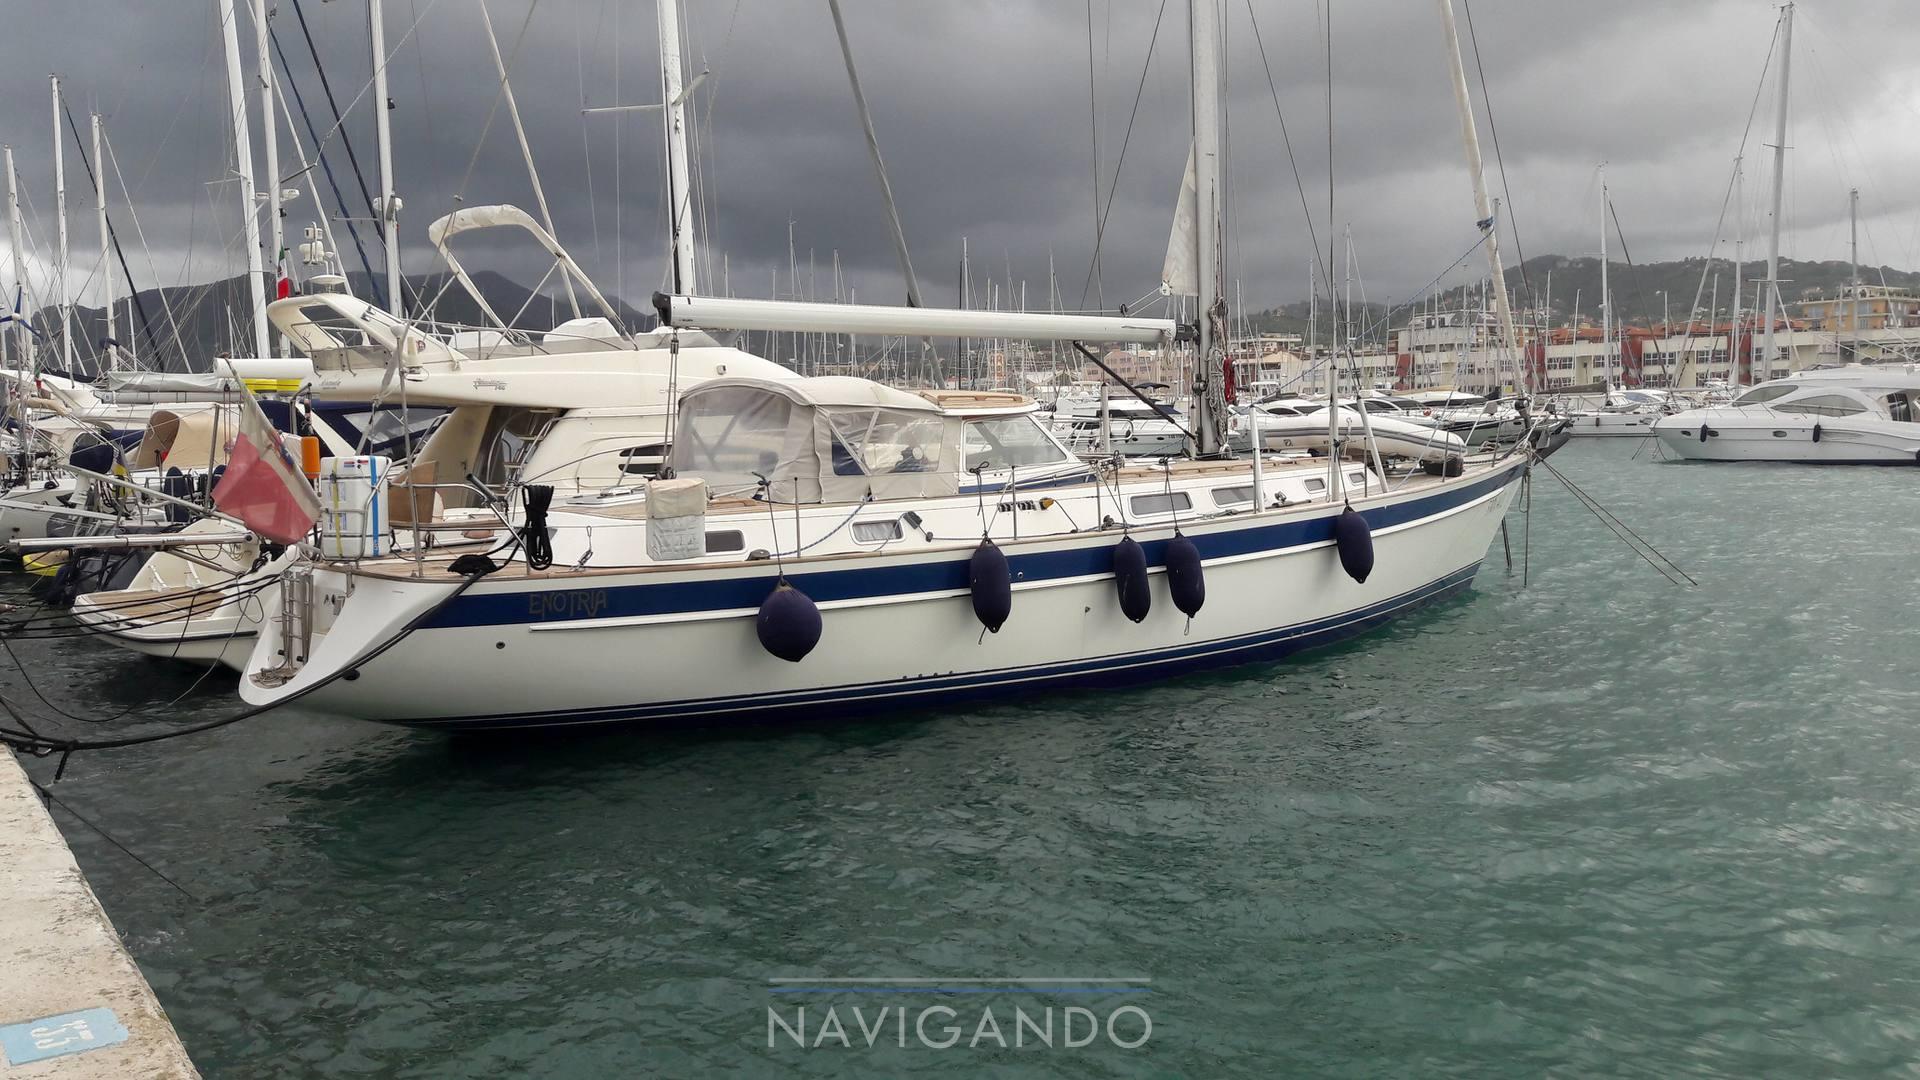 Halberg-grassy 53 ht 帆船 用于销售